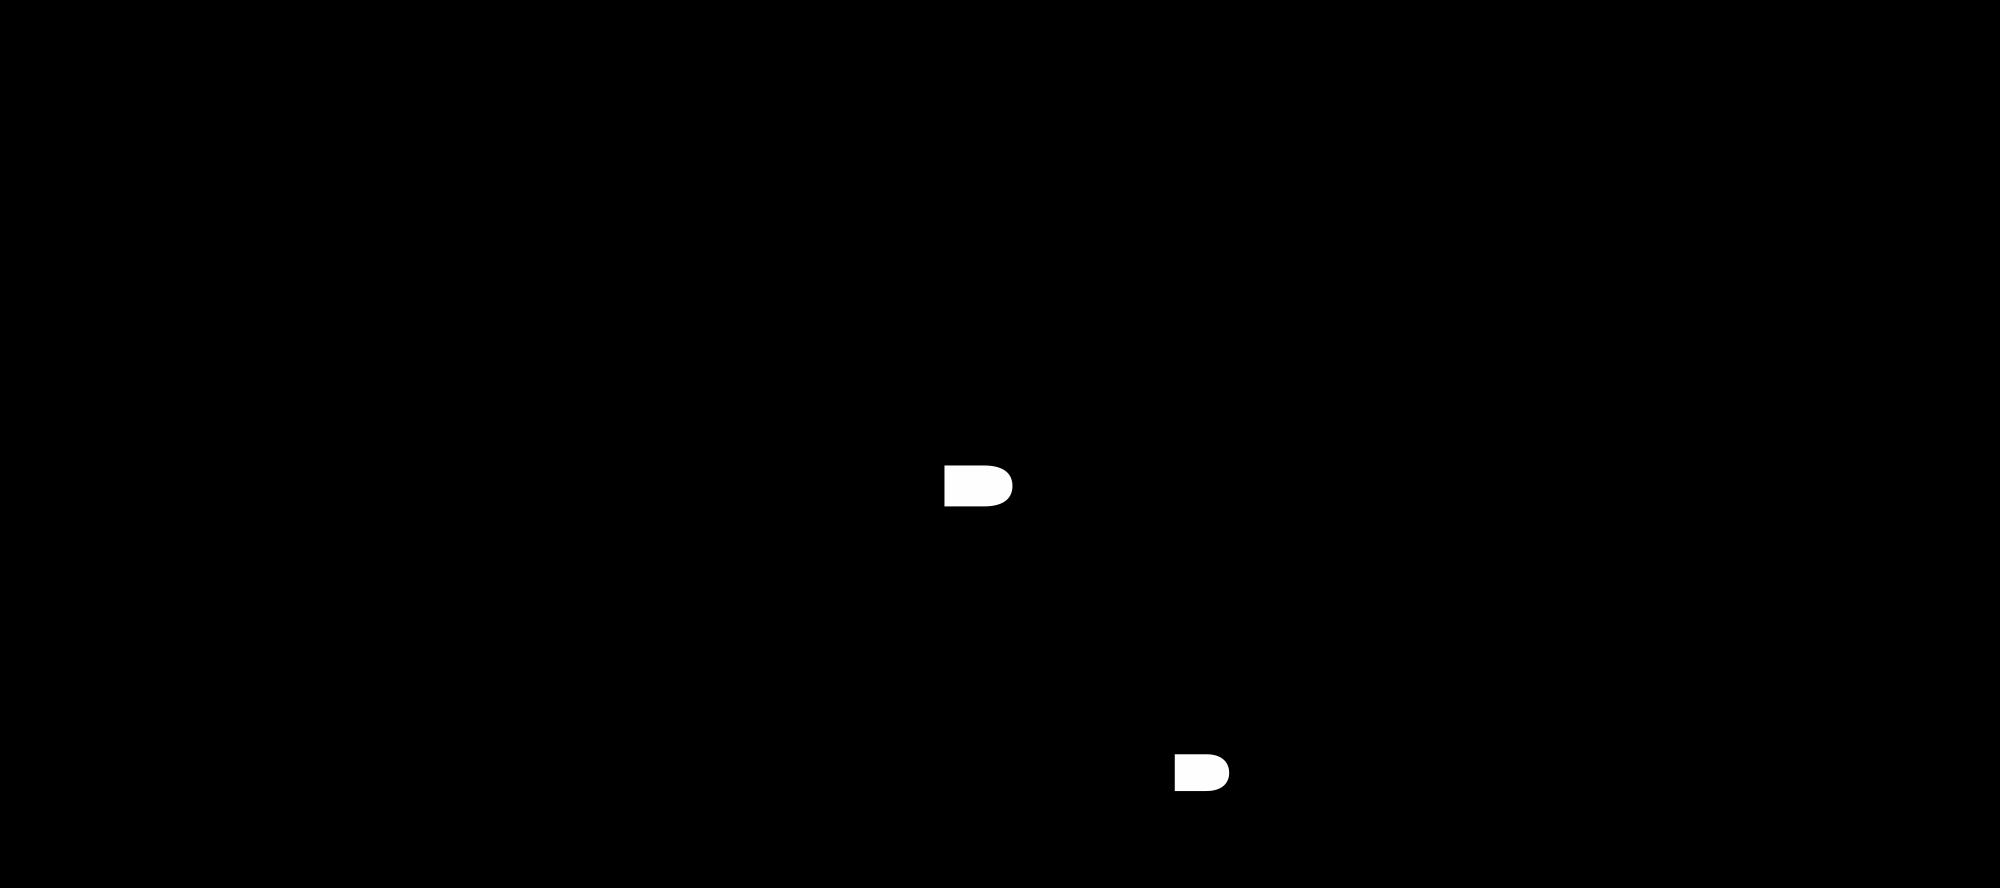 Archivo:UEFA Intertoto Cup logo.png - Wikipedia, la enciclopedia libre